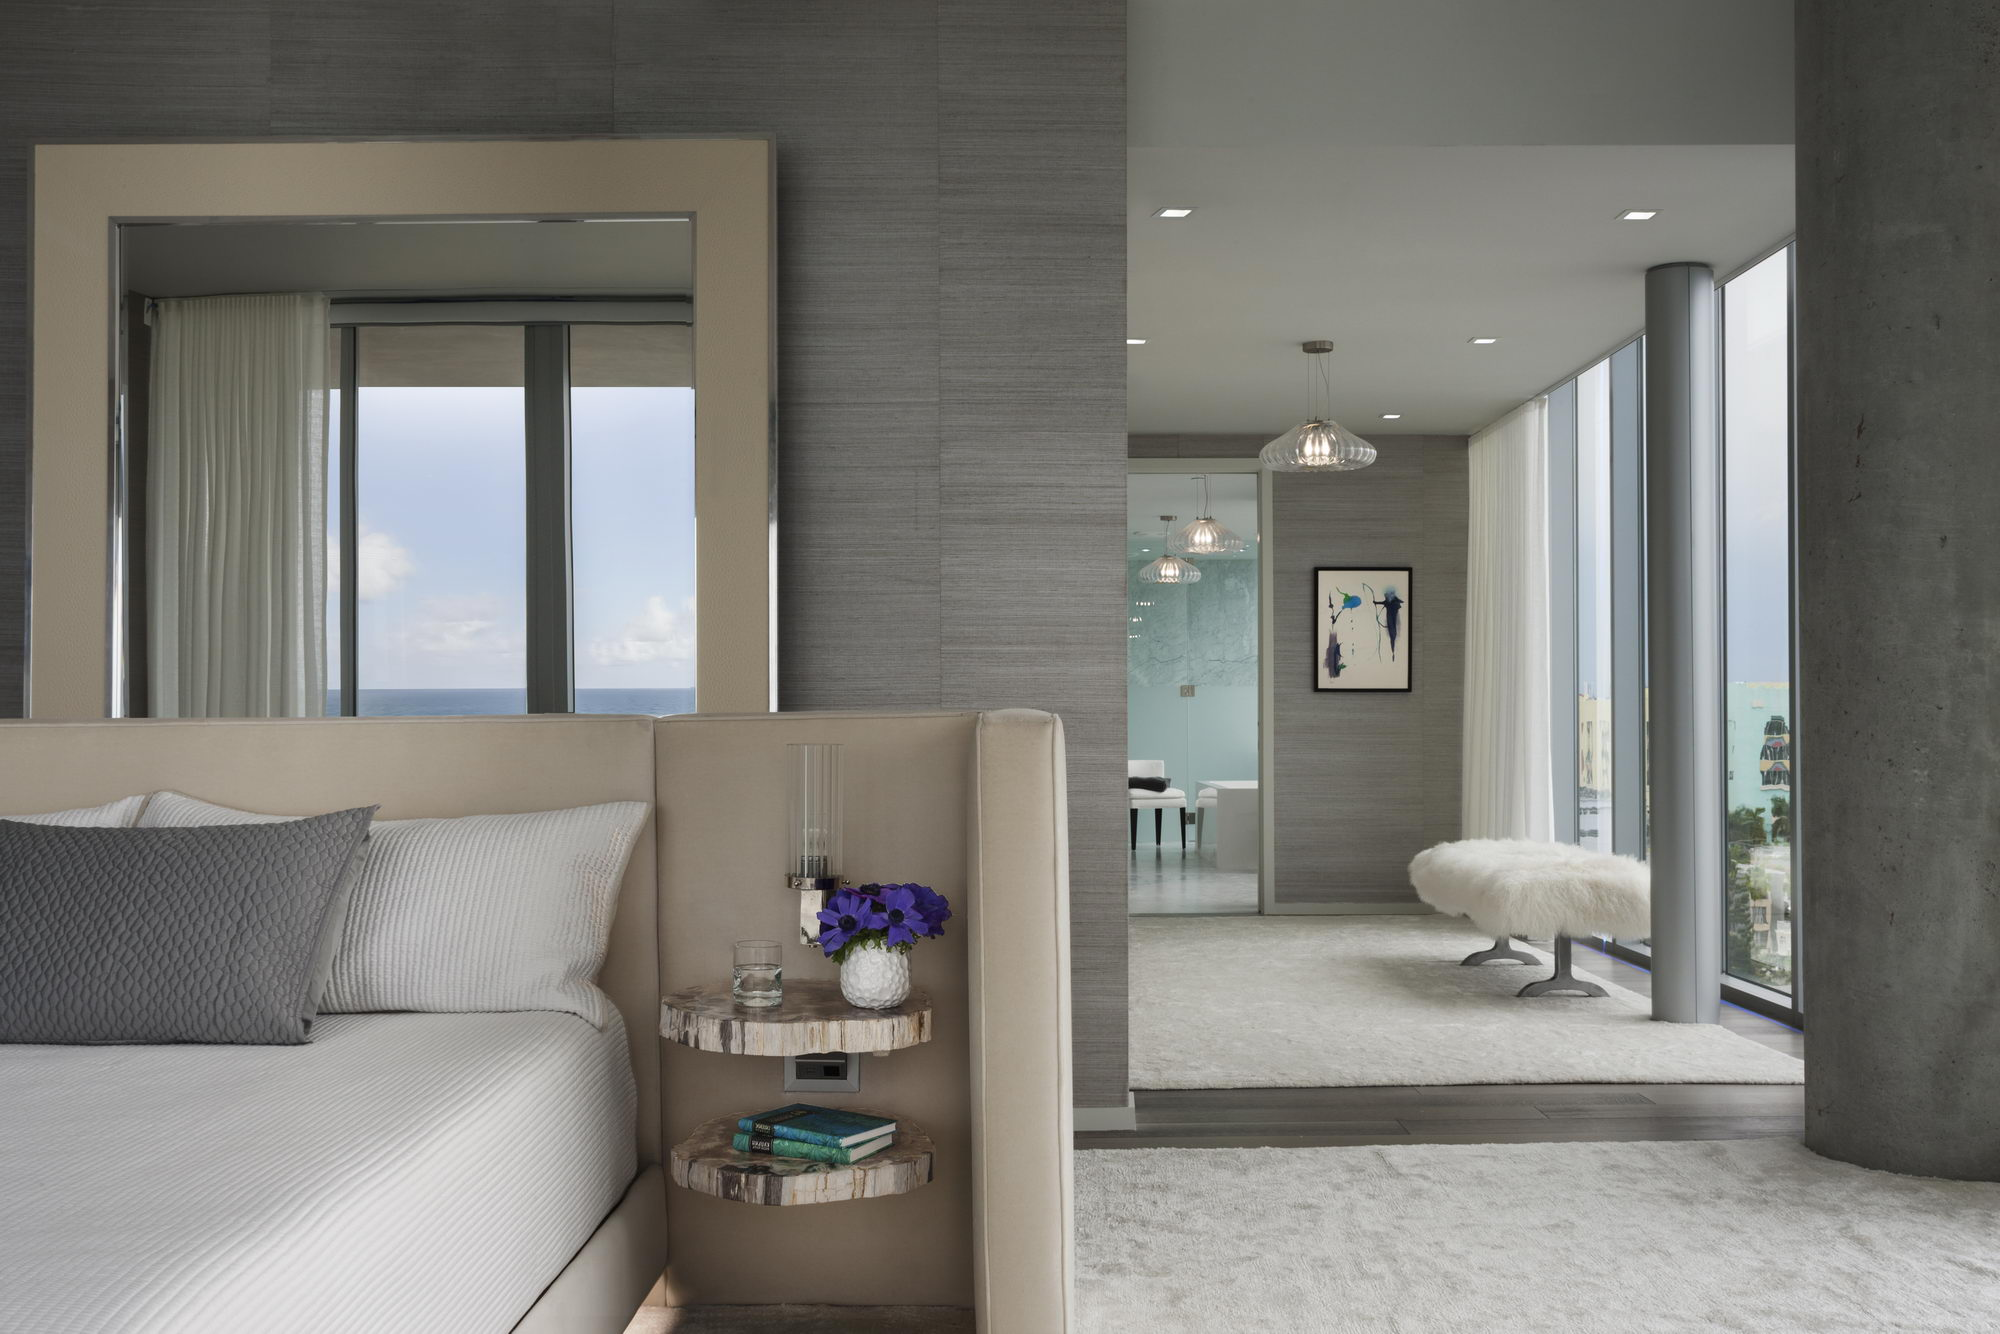 Ocean penthouse beach view south beach Miami Florida contemporary apartment master bedroom sitting bathroom